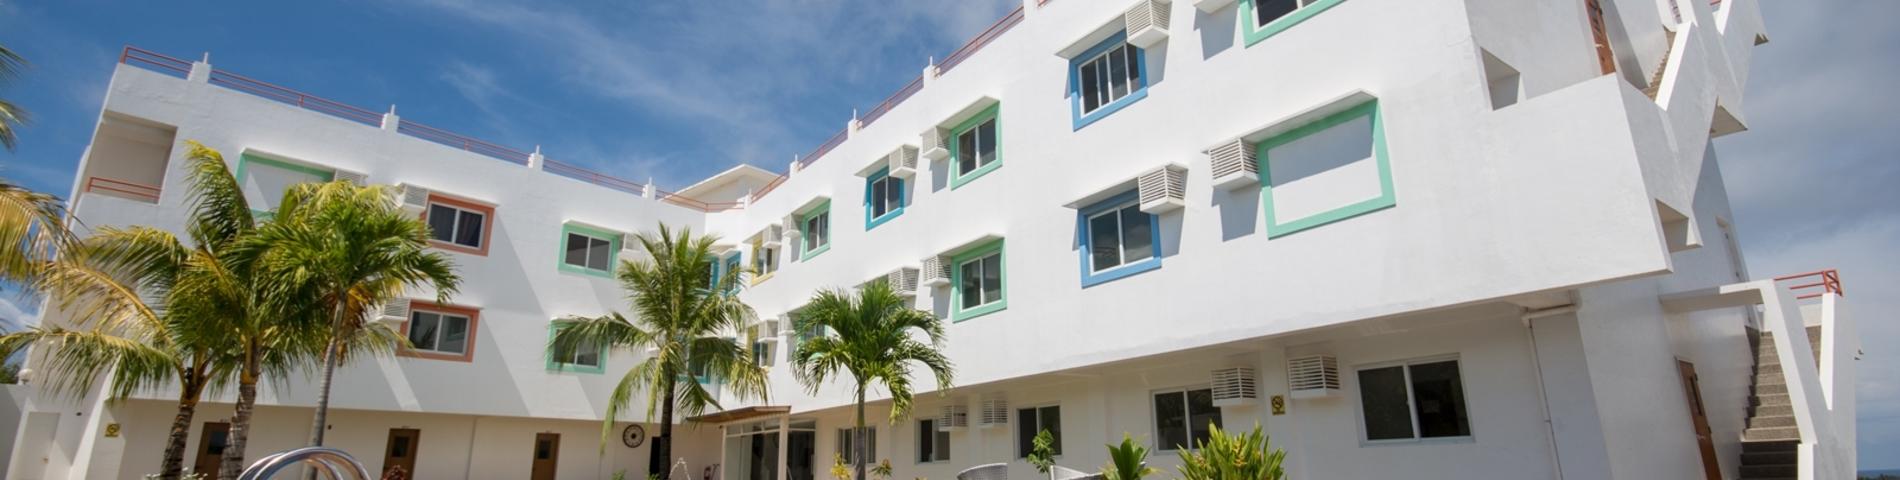 Imatge 1 de l'escola Boracay COCO